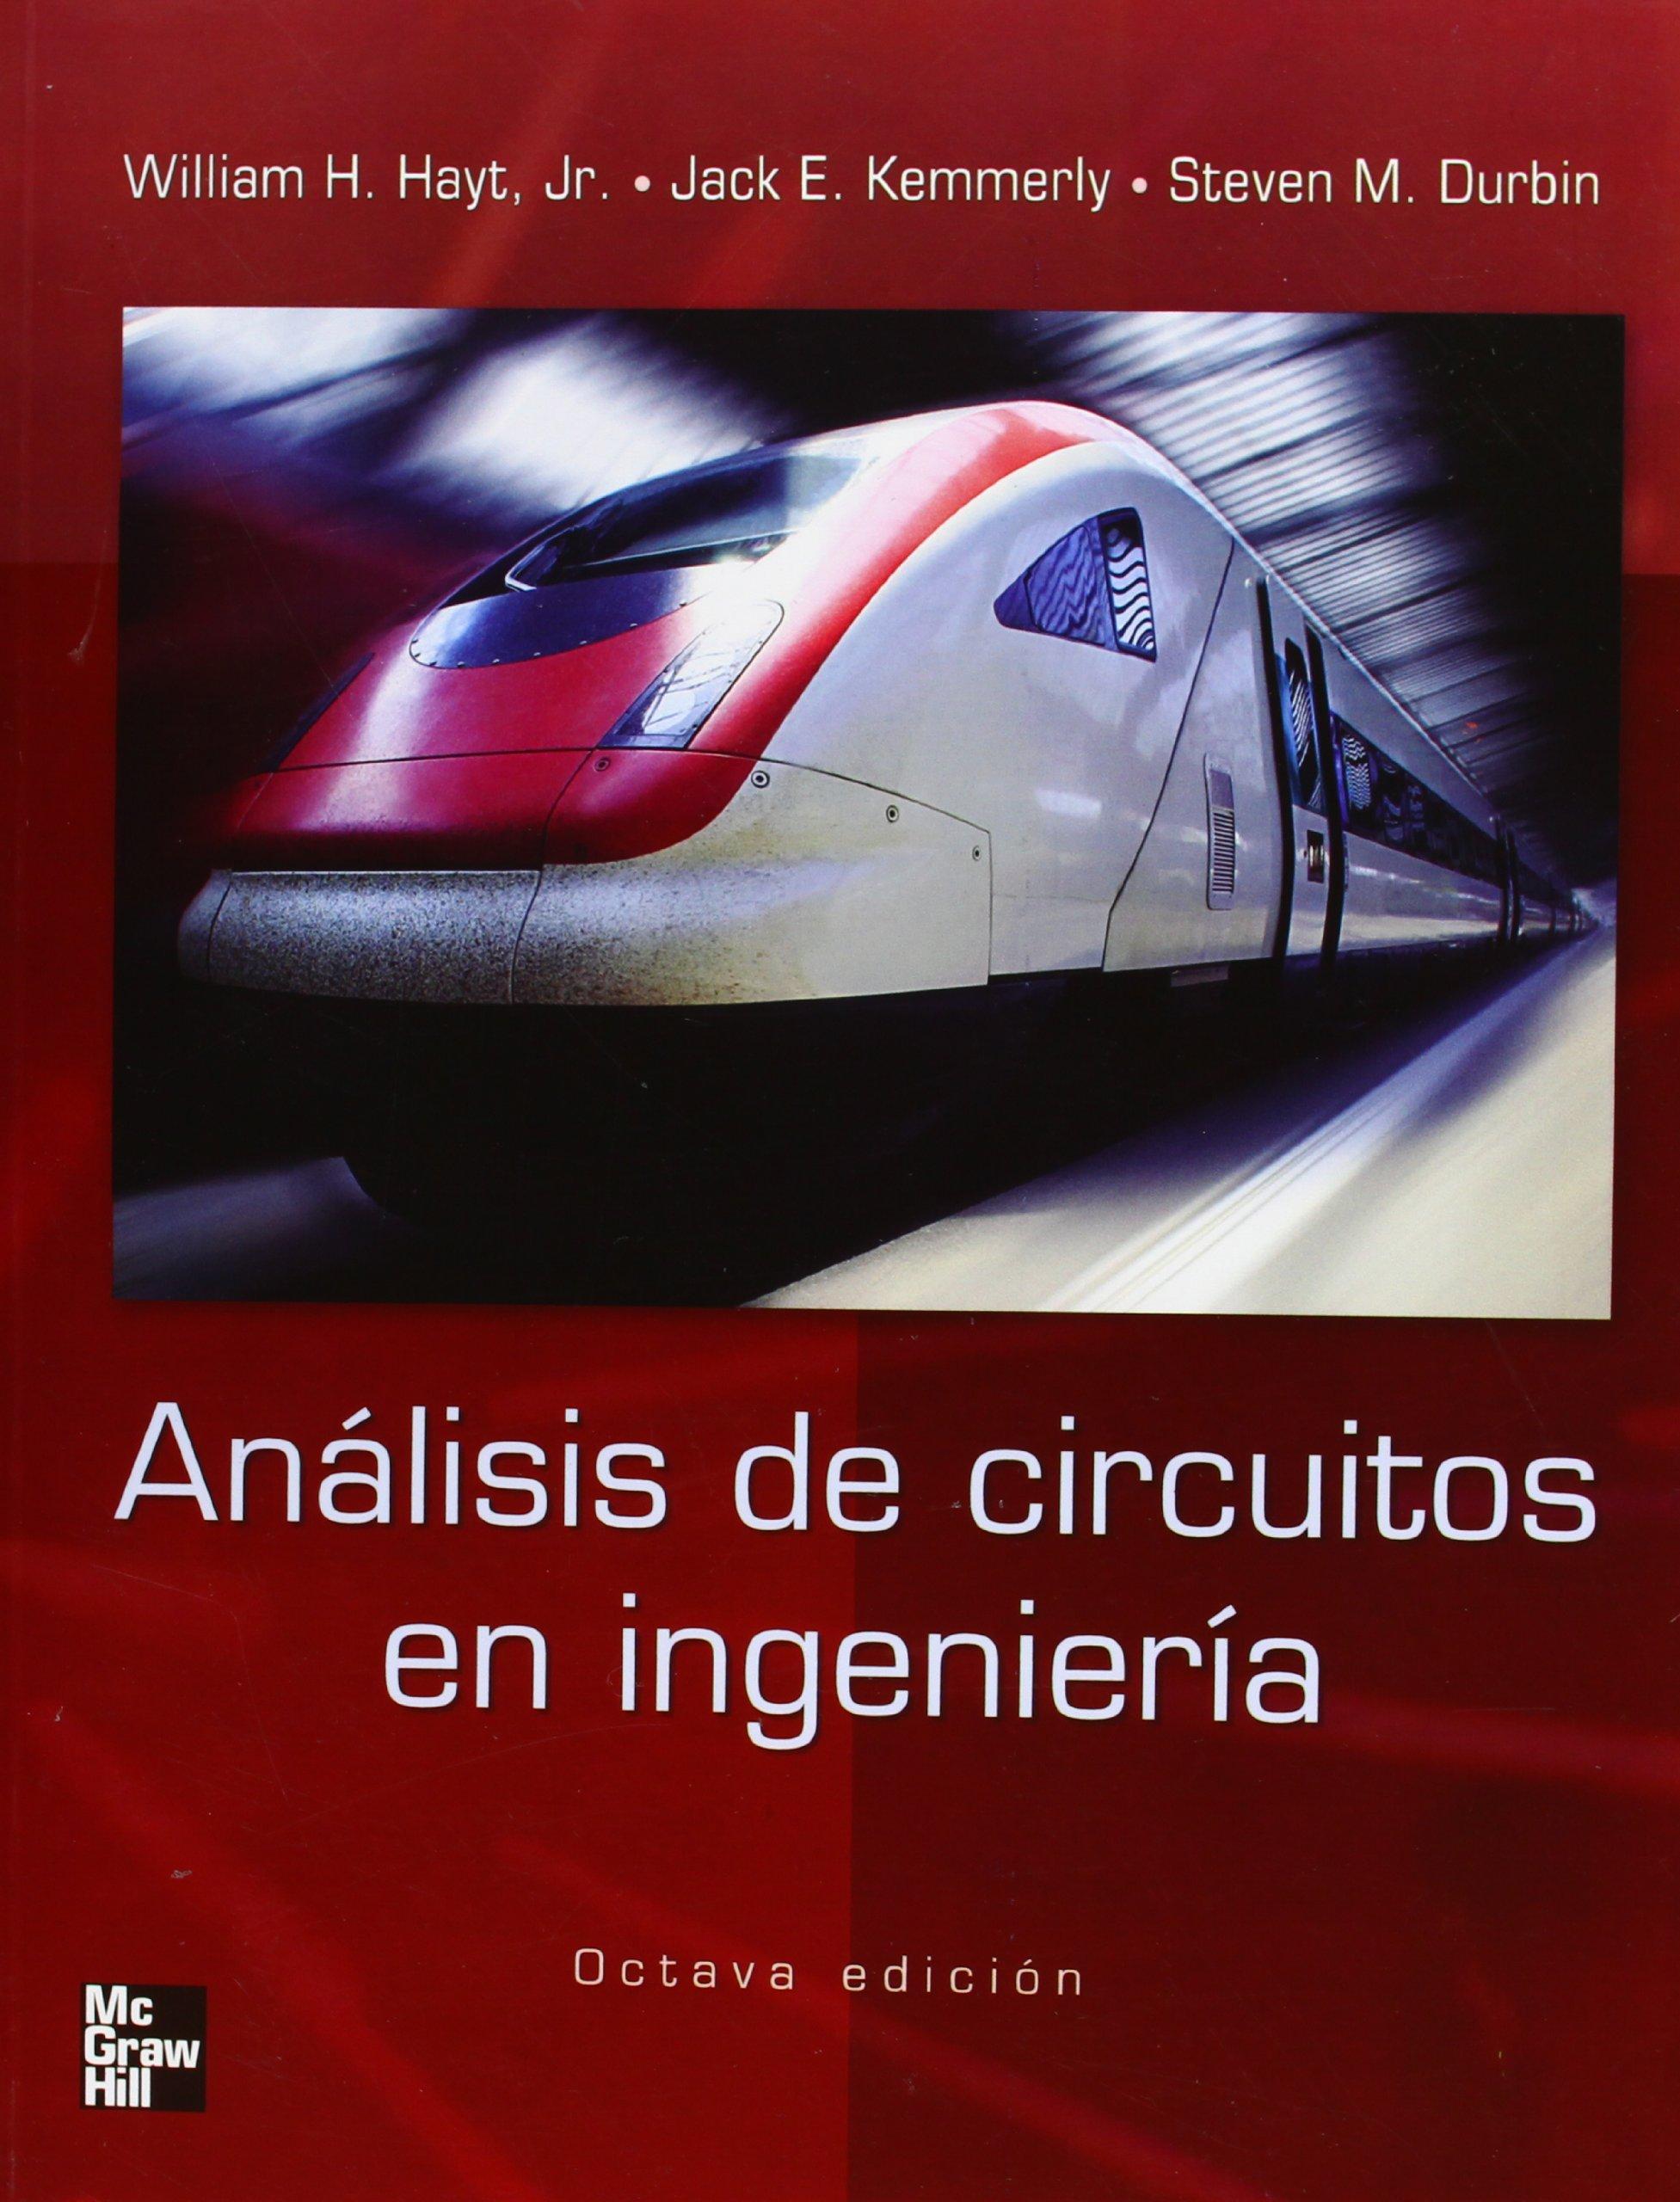 ANALISIS DE CIRCUITOS EN INGENIERIA: Amazon.es: William Hyatt, Jack Kemmerly, Steven Durbin: Libros